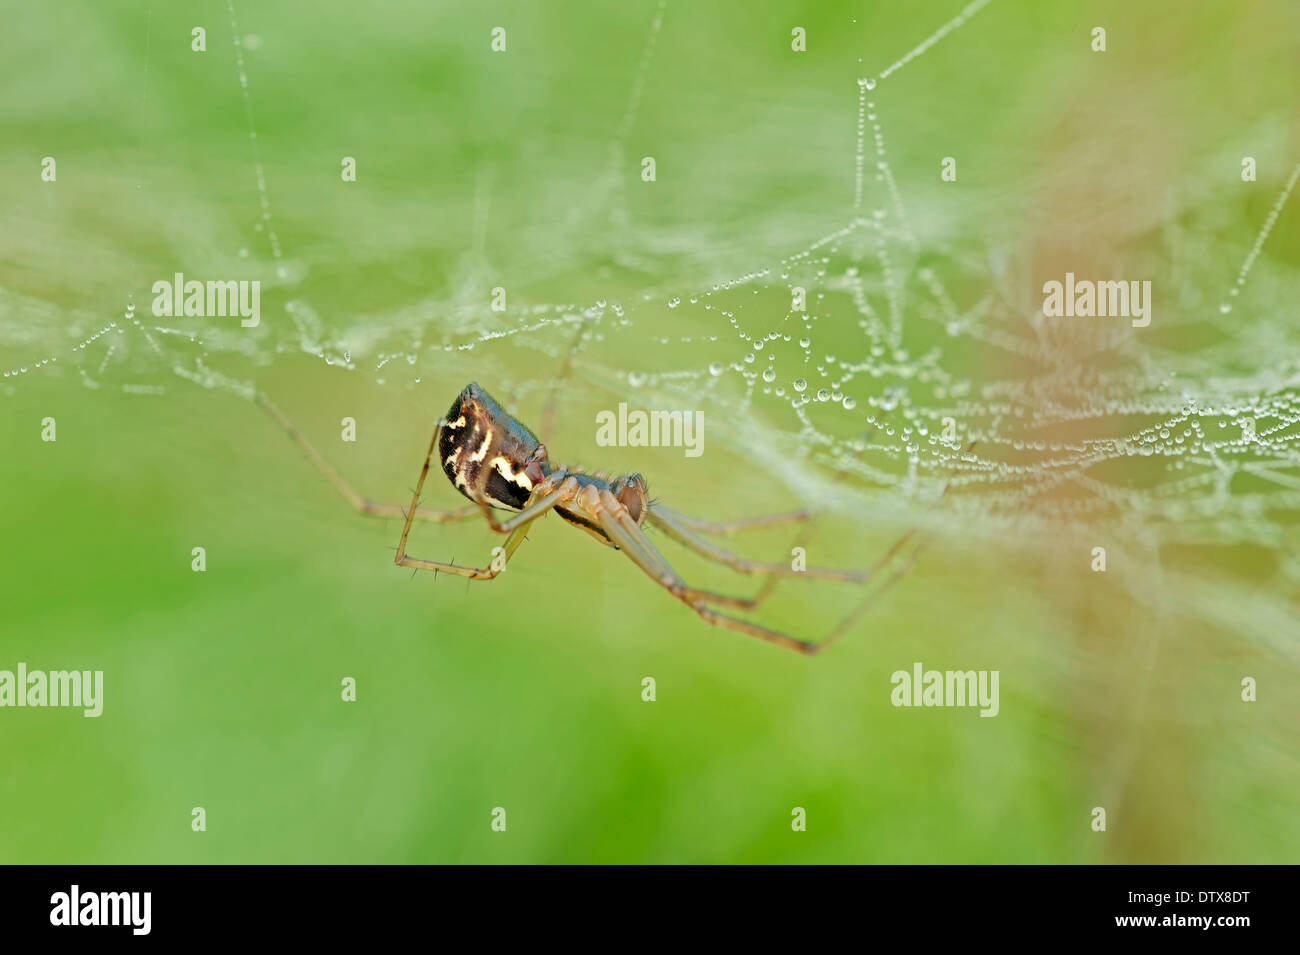 Sheet-Web Spider - Stock Image